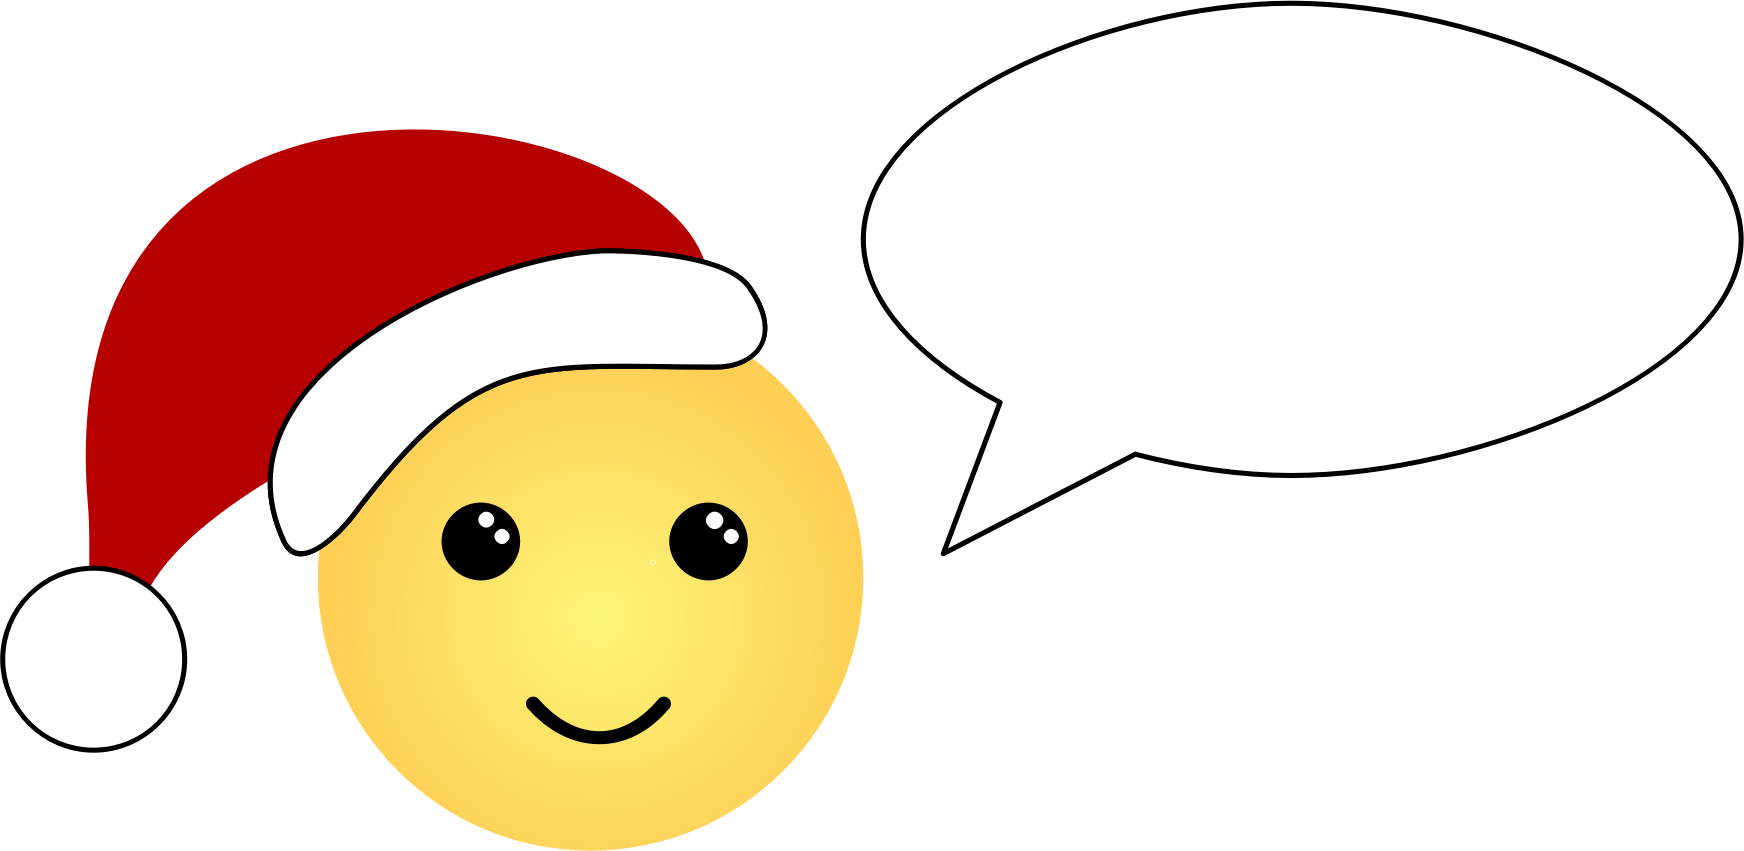 Free christmas by chihuahuadesign. Thanks clipart emoji